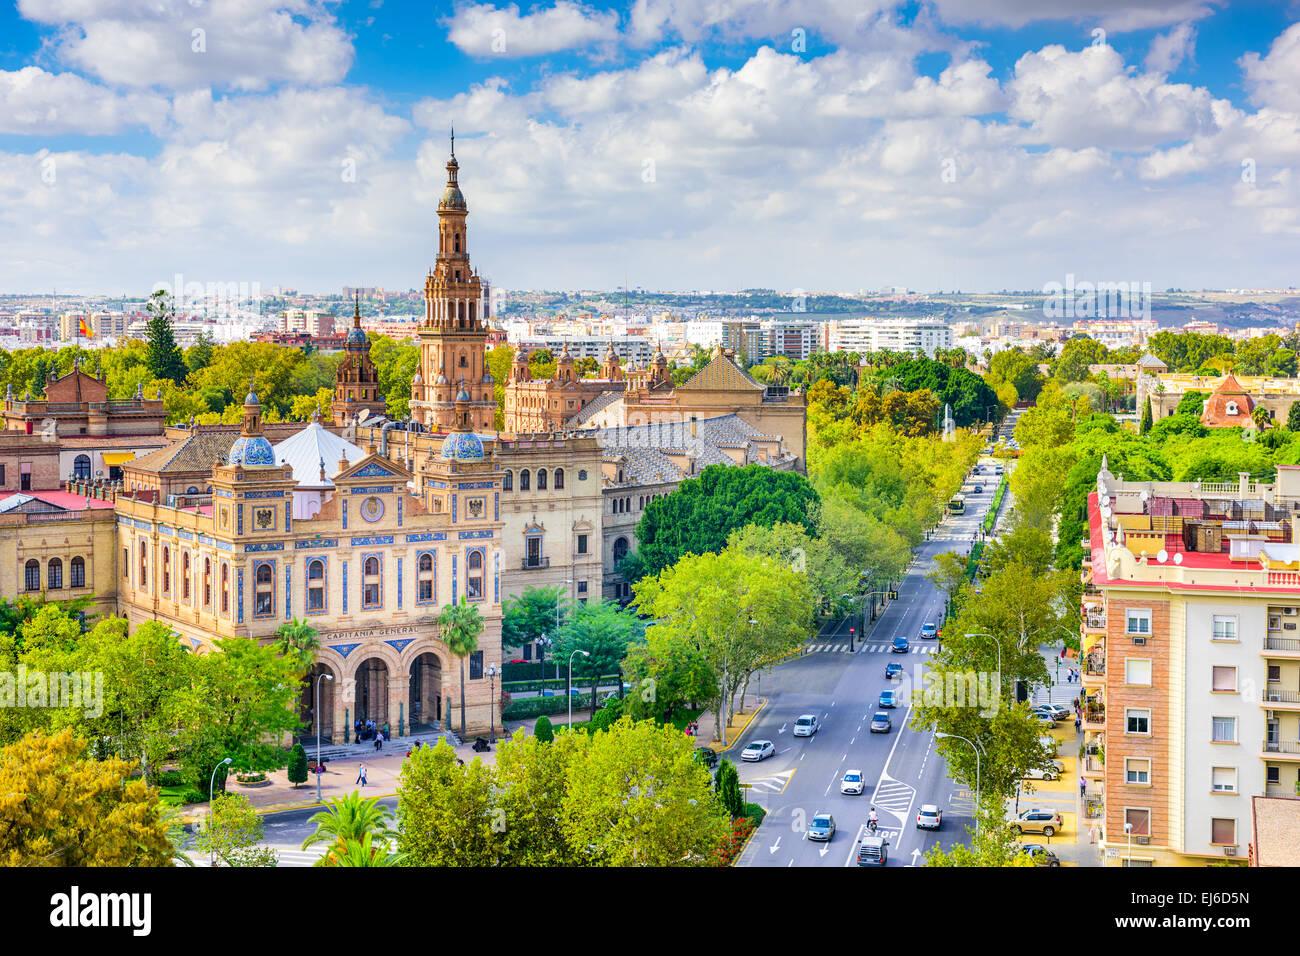 Sevilla, Spanien Stadtbild in Richtung Plaza de Espana. Stockbild